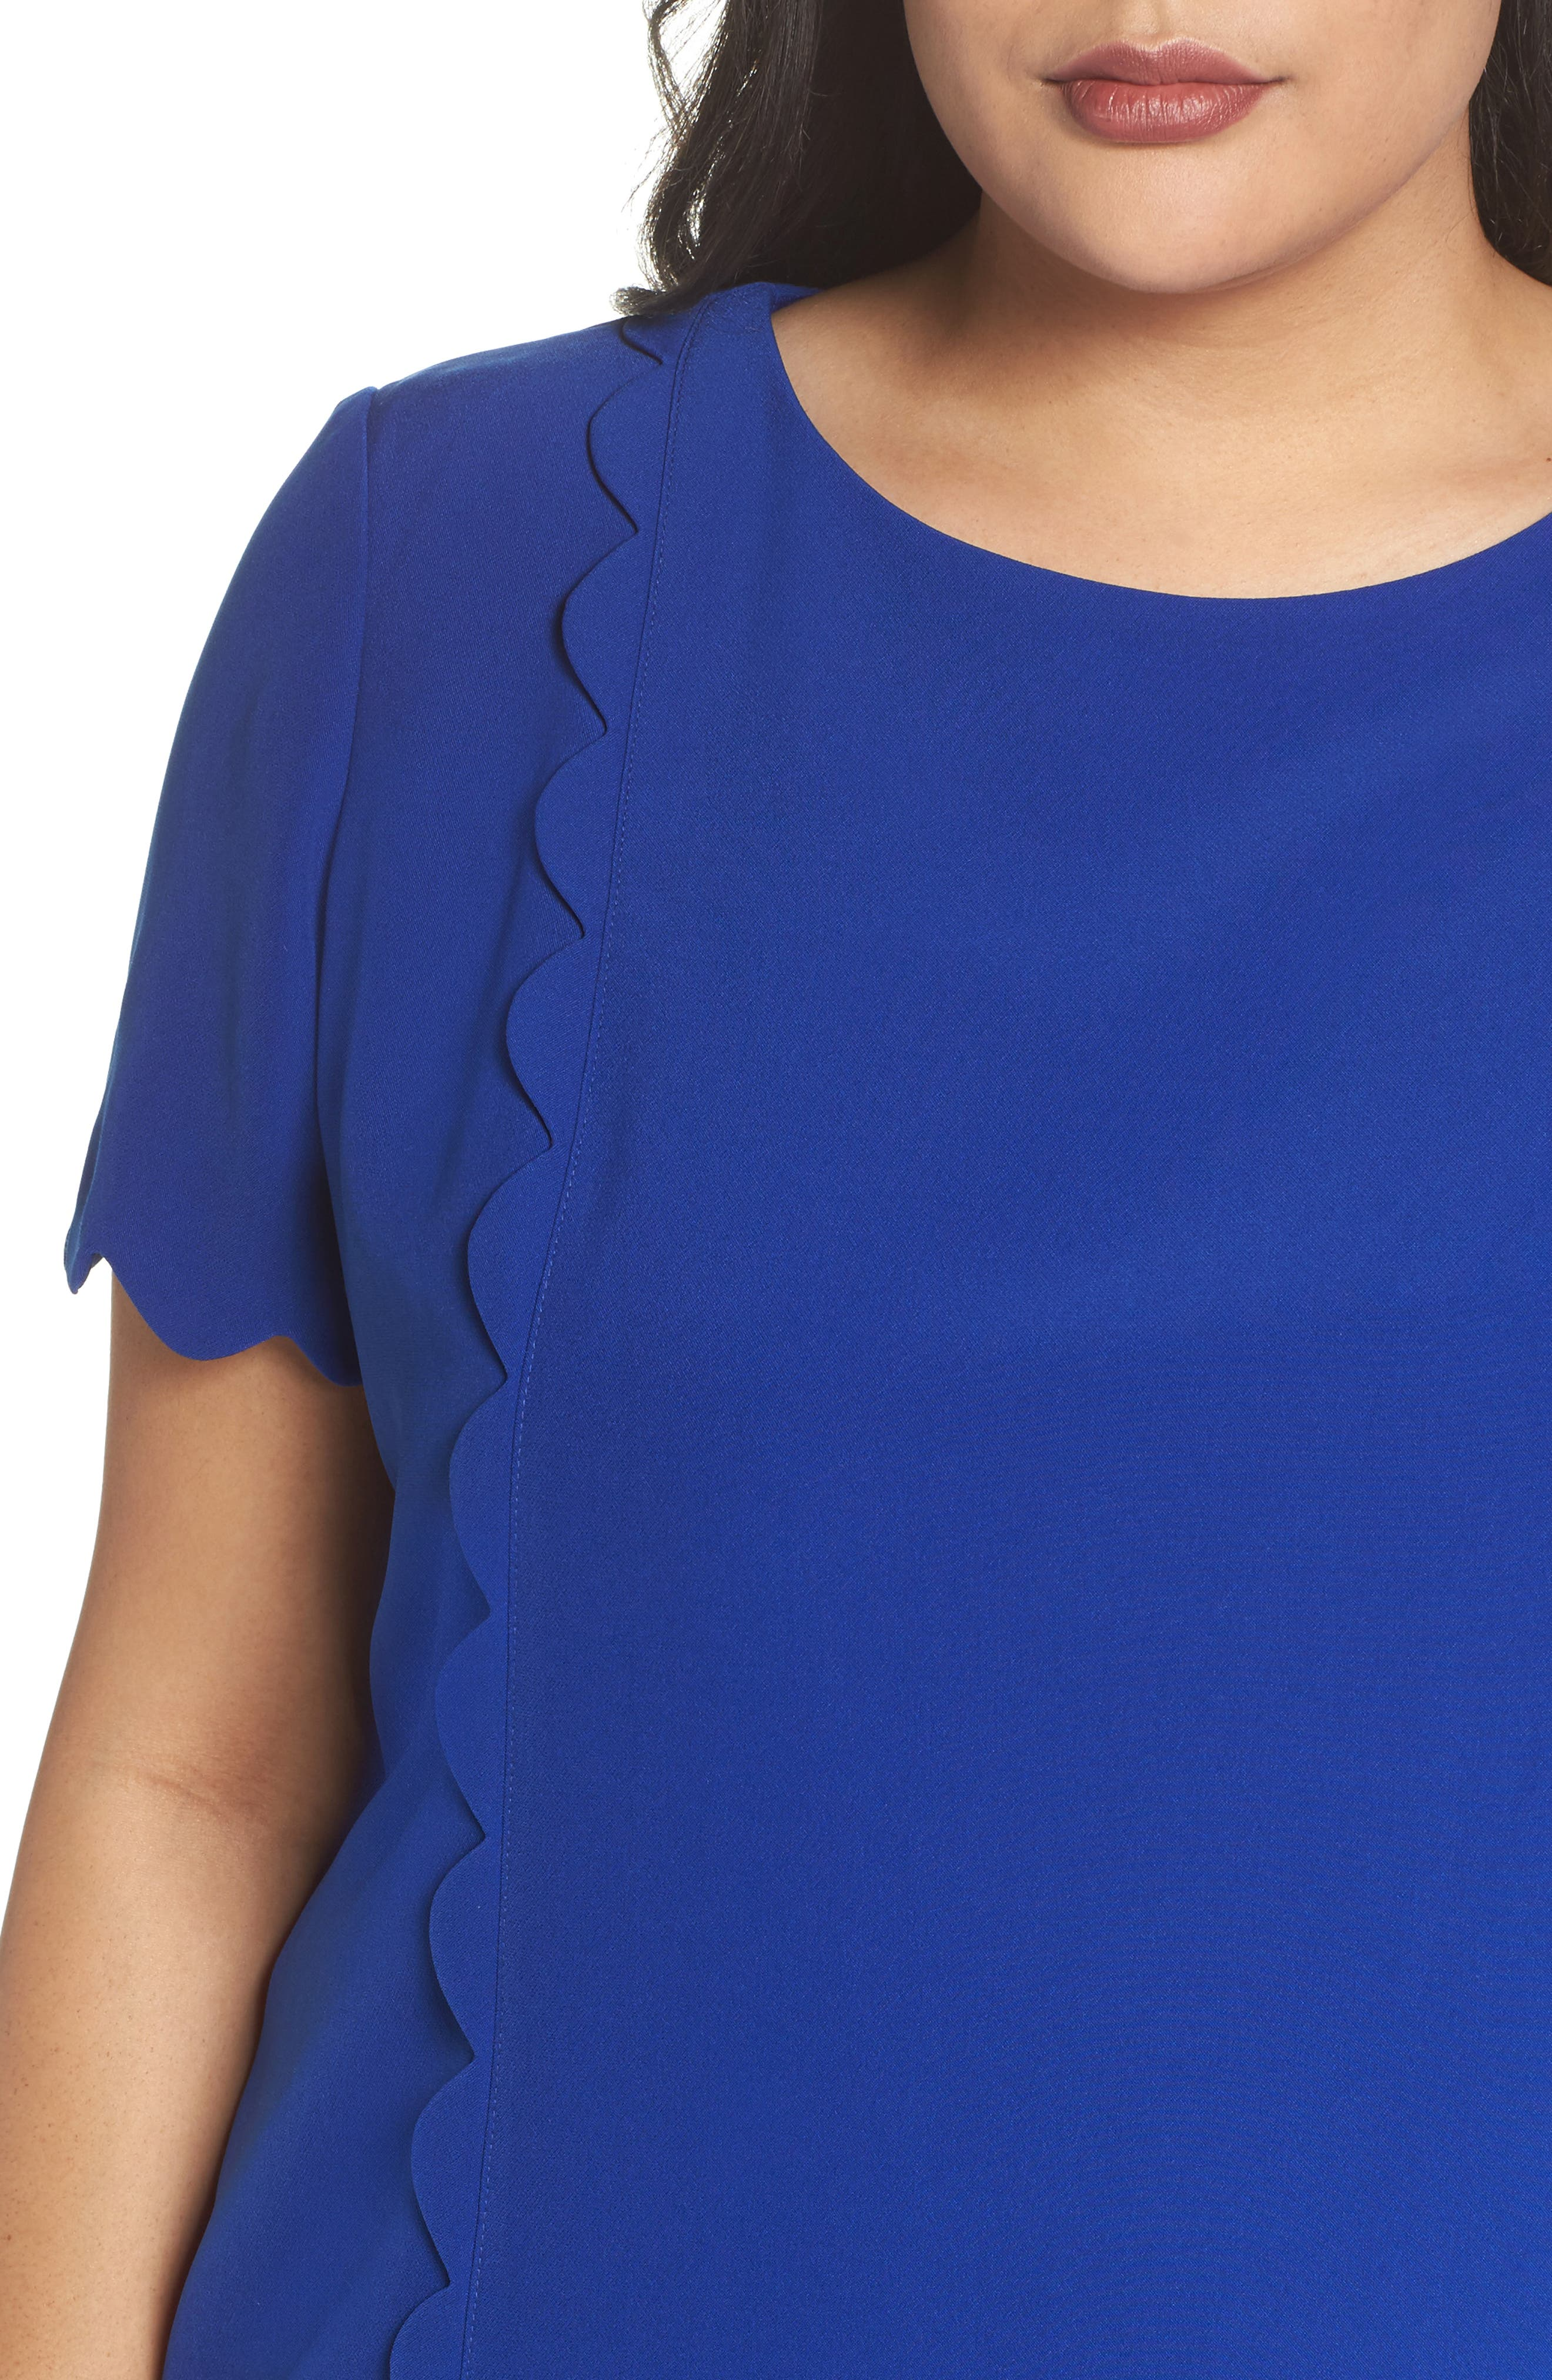 Scalloped Trim Shift Dress,                             Alternate thumbnail 4, color,                             480